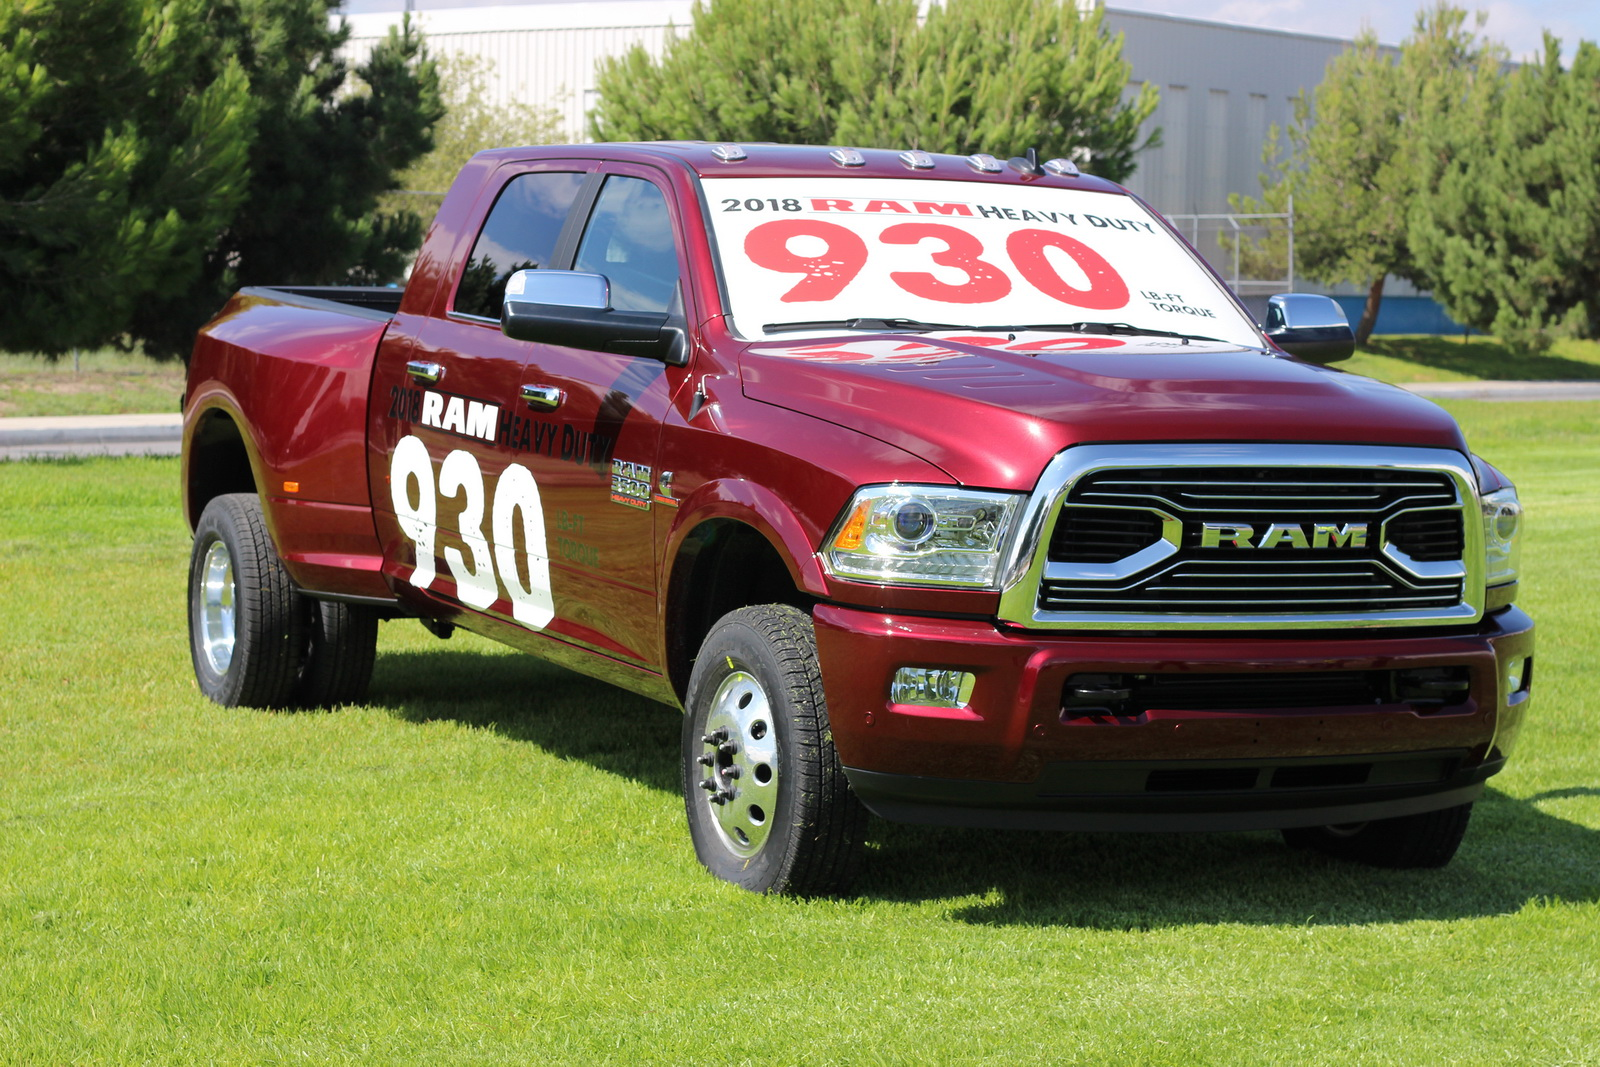 Ram Reveals 2018 3500 Heavy Duty, The Segment's Most Powerful Pickup Truck